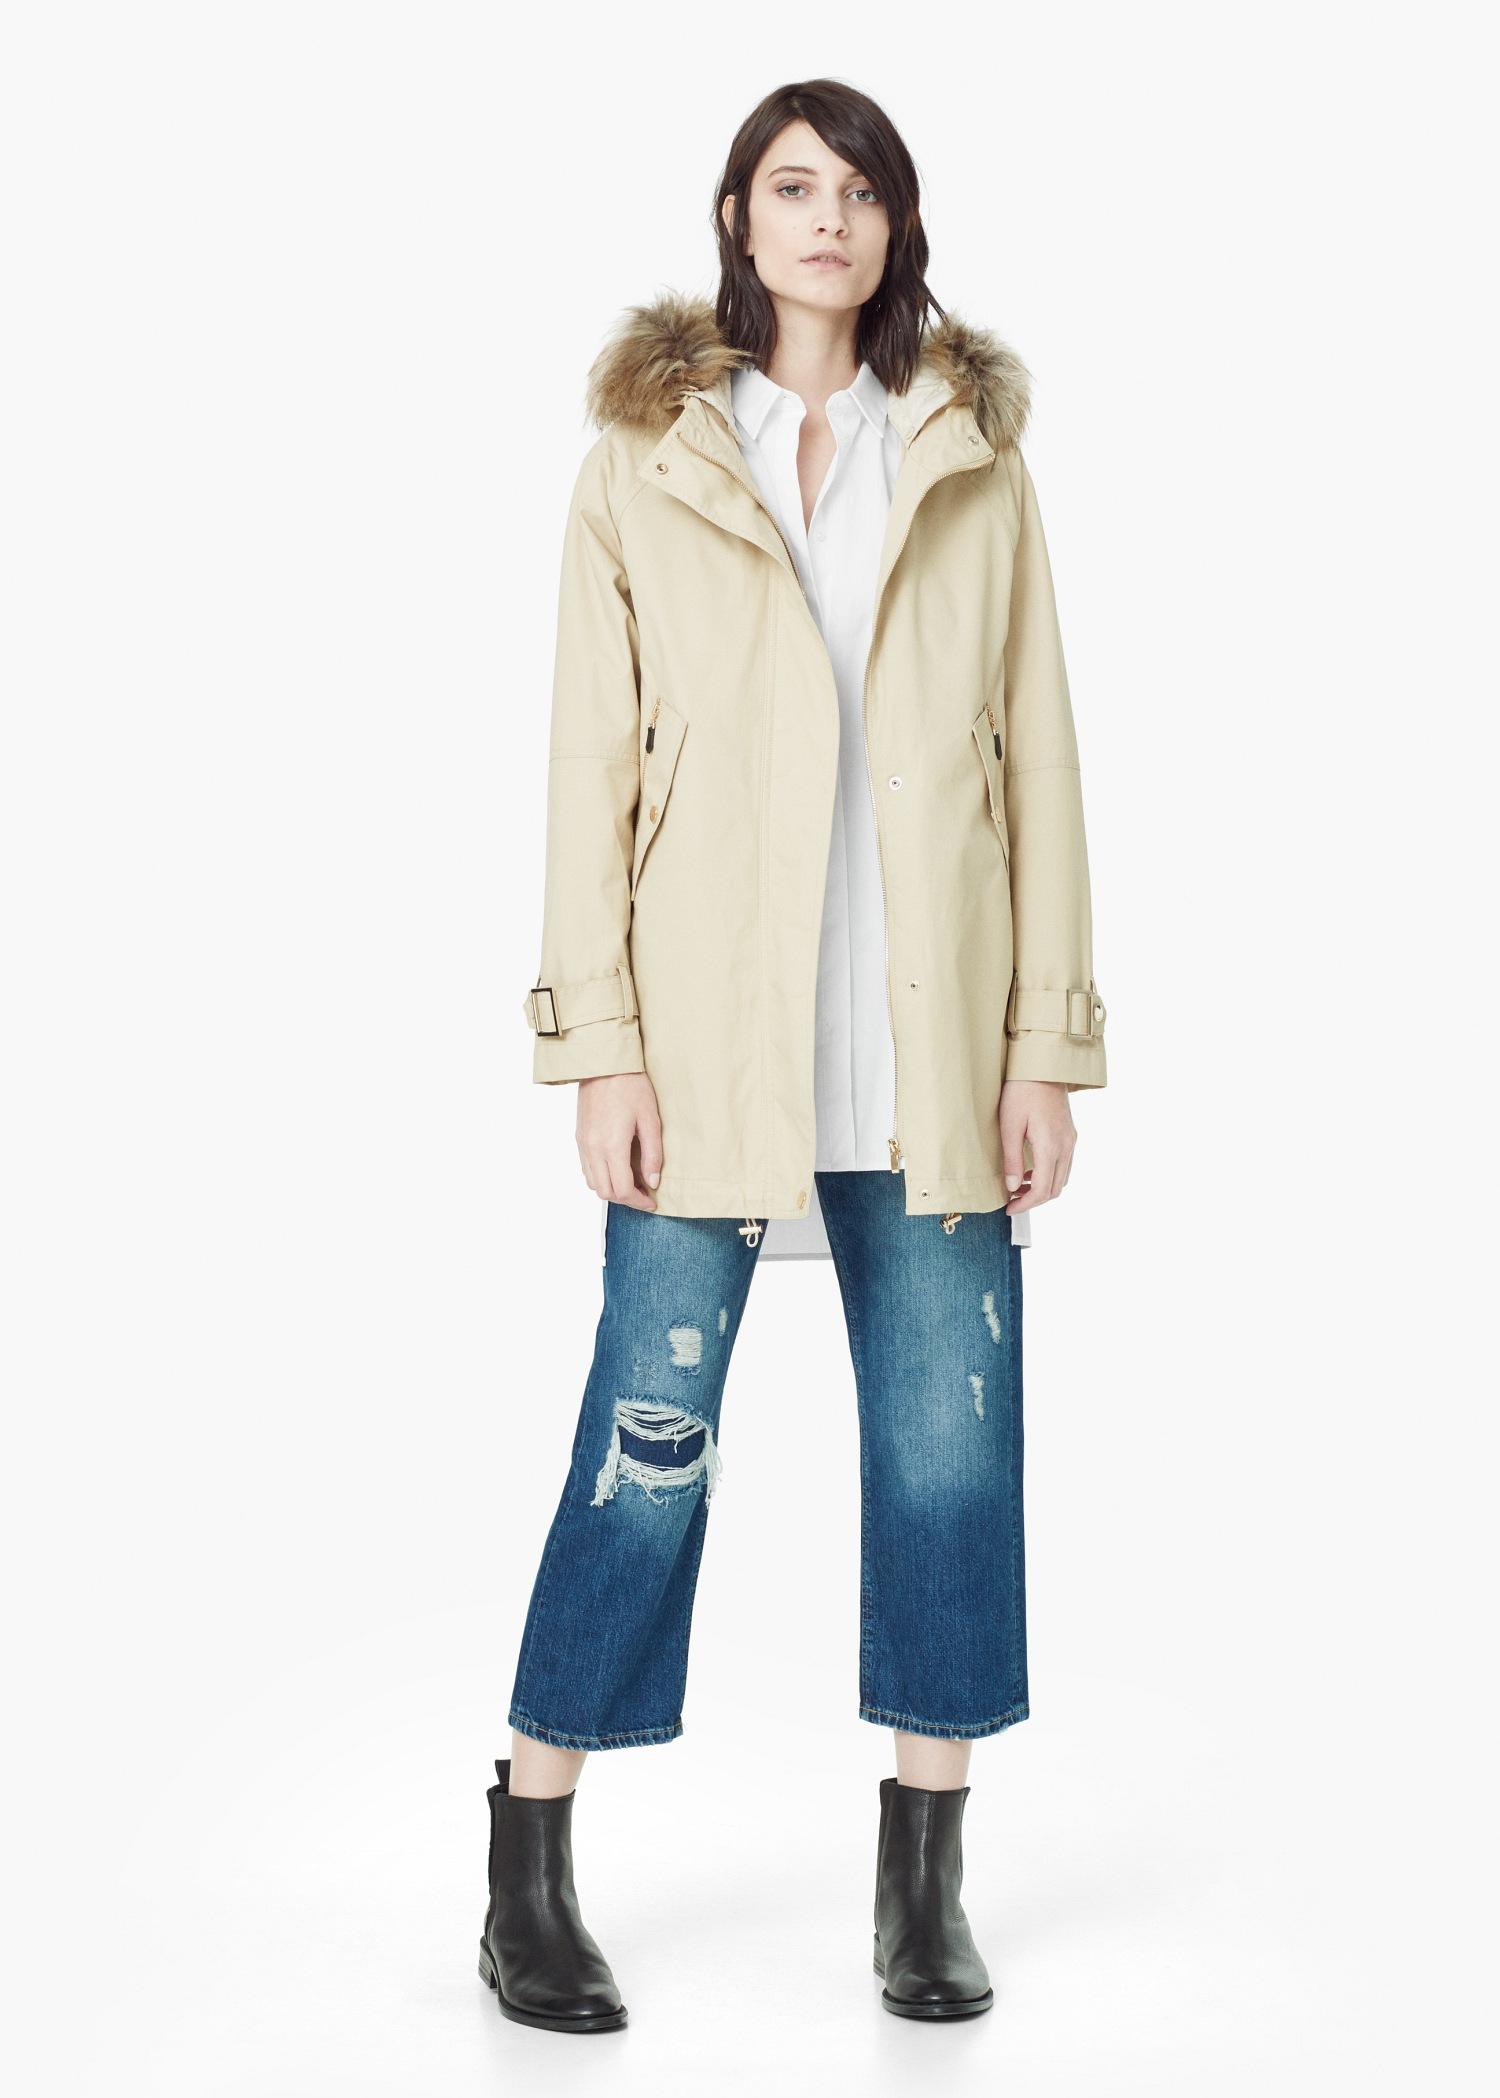 Faux Fur Hooded Coat Fashion Women S Coat 2017